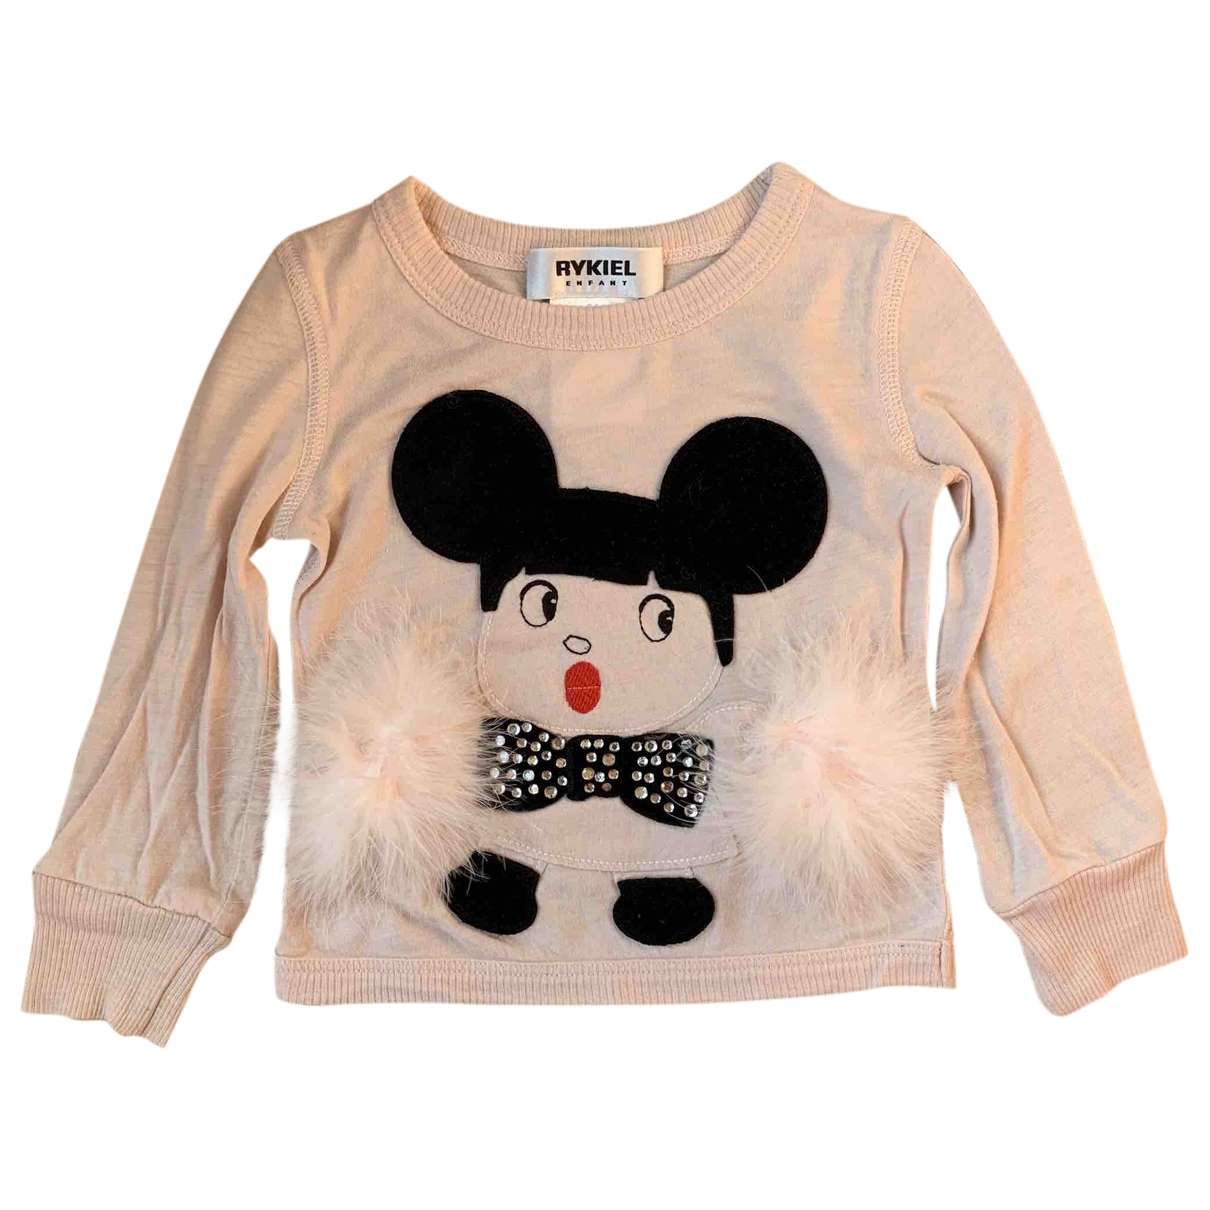 Sonia Rykiel \N Pink  top for Kids 2 years - up to 86cm FR